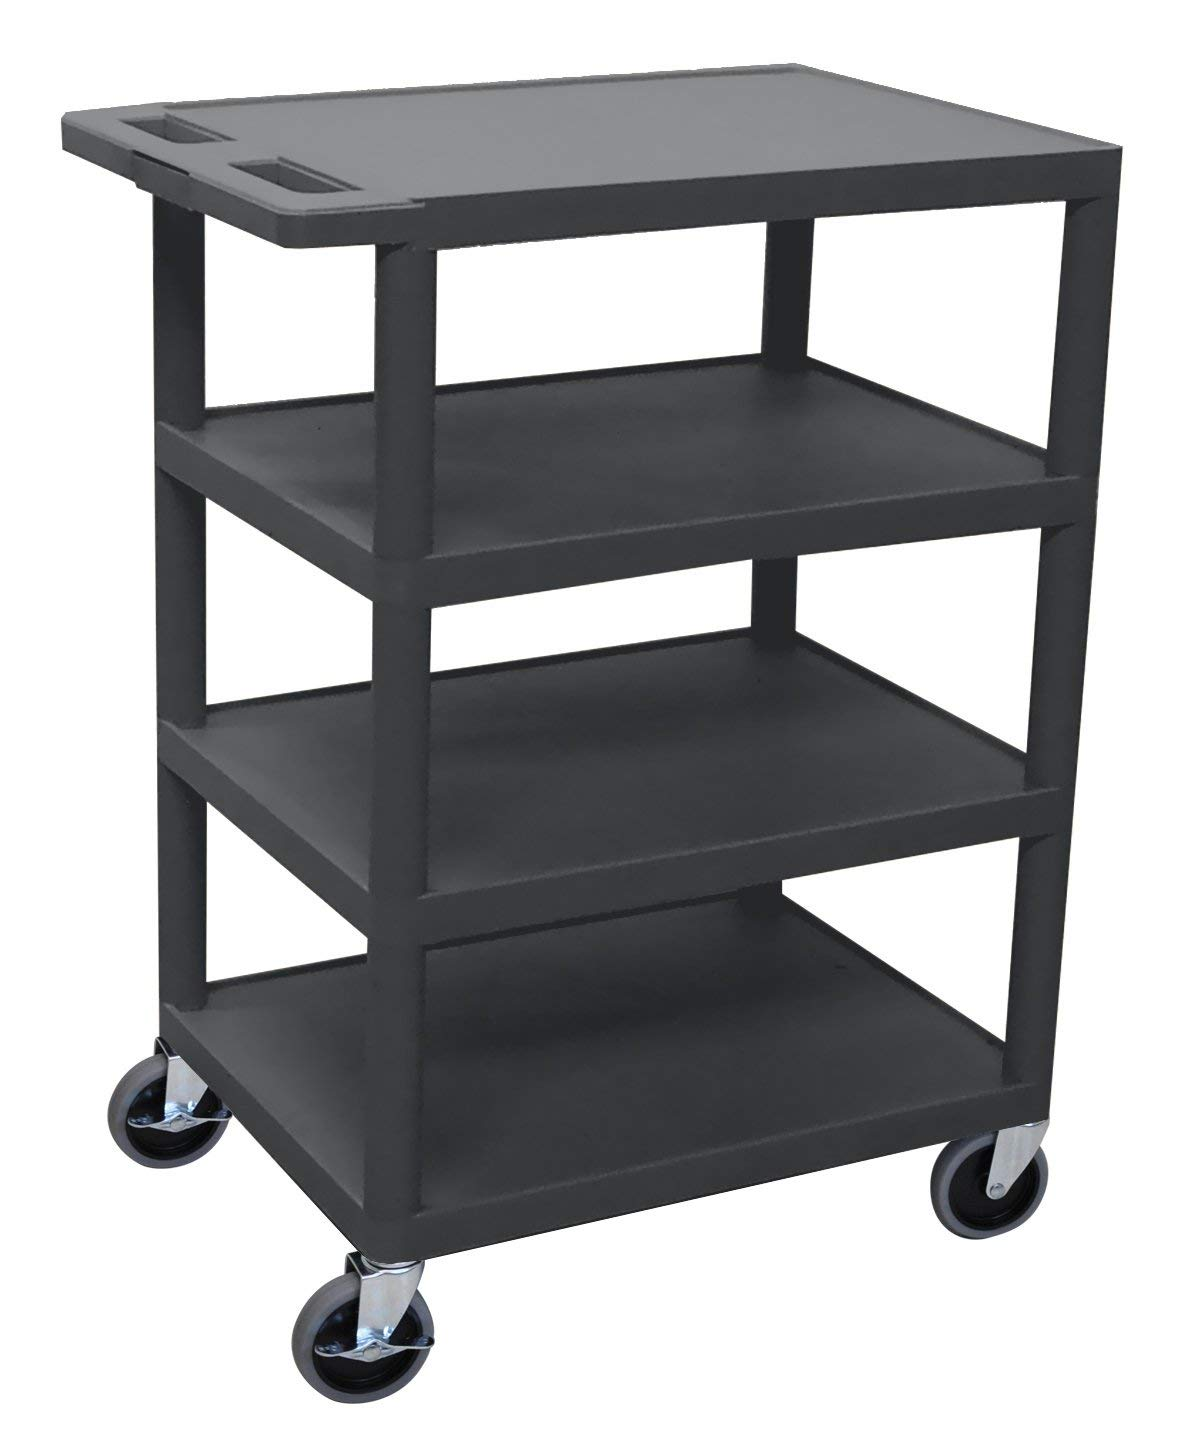 "LUXOR BC45-BU Flush-Shelf Carts, 4 Shelves, 24"""" W x 18"""" D x 36"""" H, Blue , Automotive, tool & industrial , Office maintenance, janitorial & lunchroom , Carts , Service/utility"